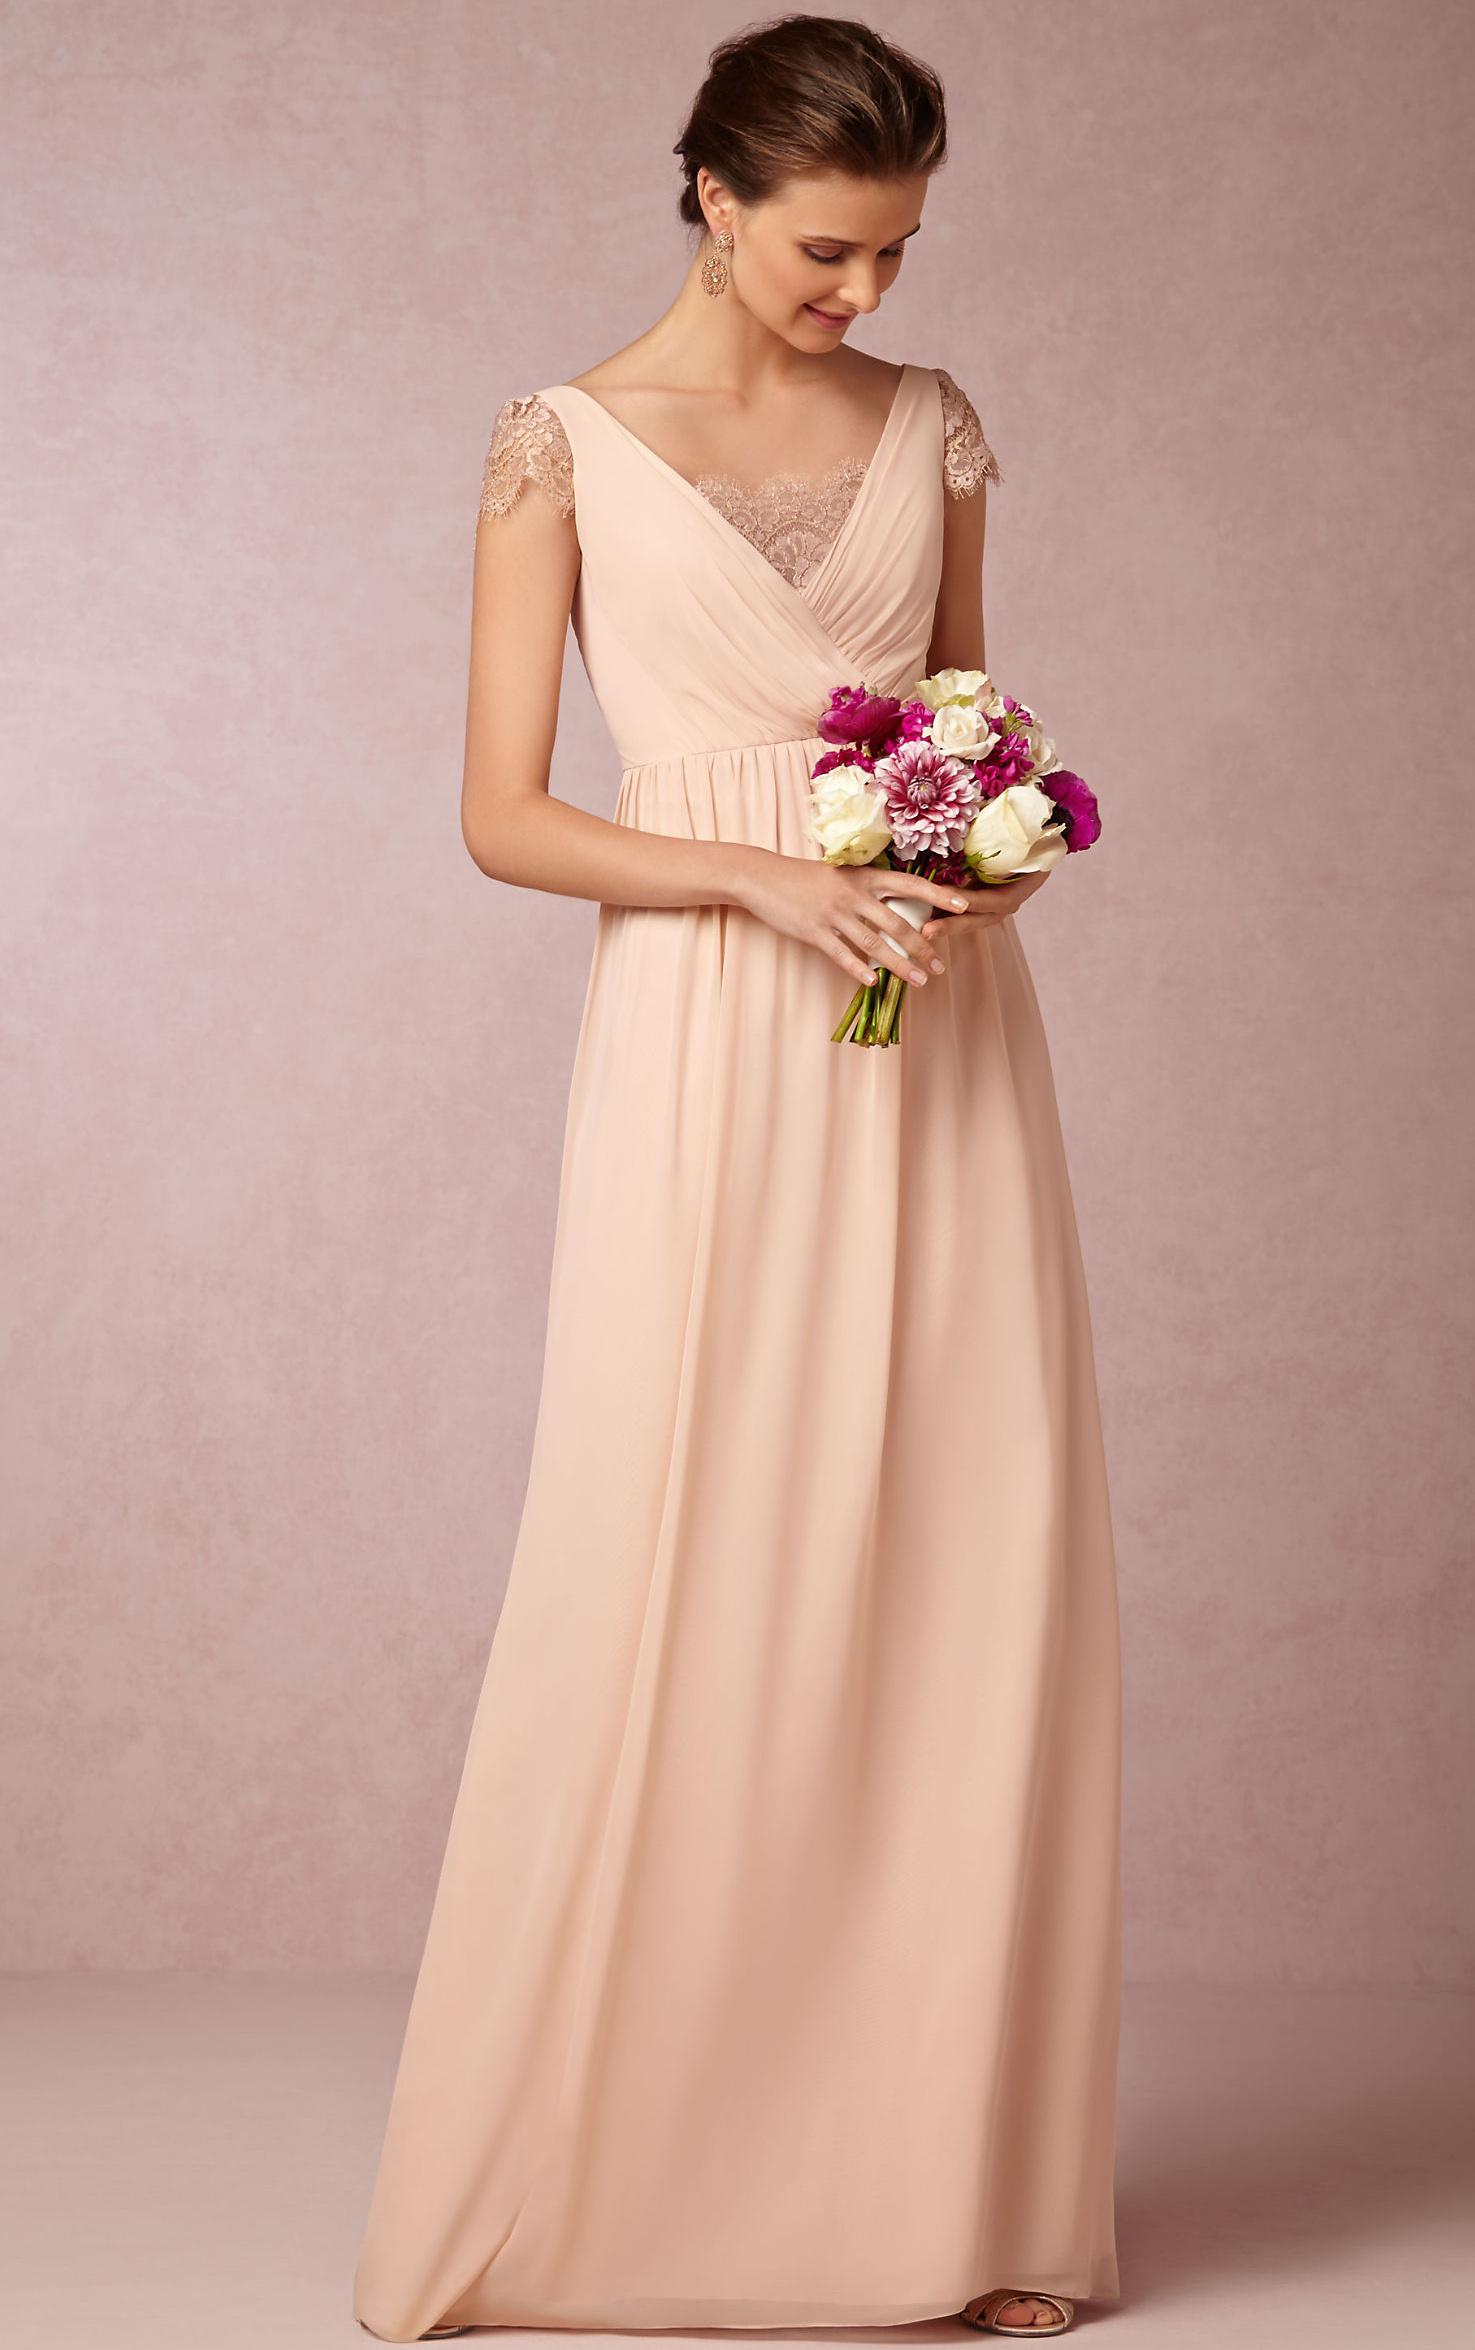 http://www.aislestyle.co.uk/aline-chiffon-floorlength-sleeveless-zipper-bridesmaid-dresses-p-3535.html